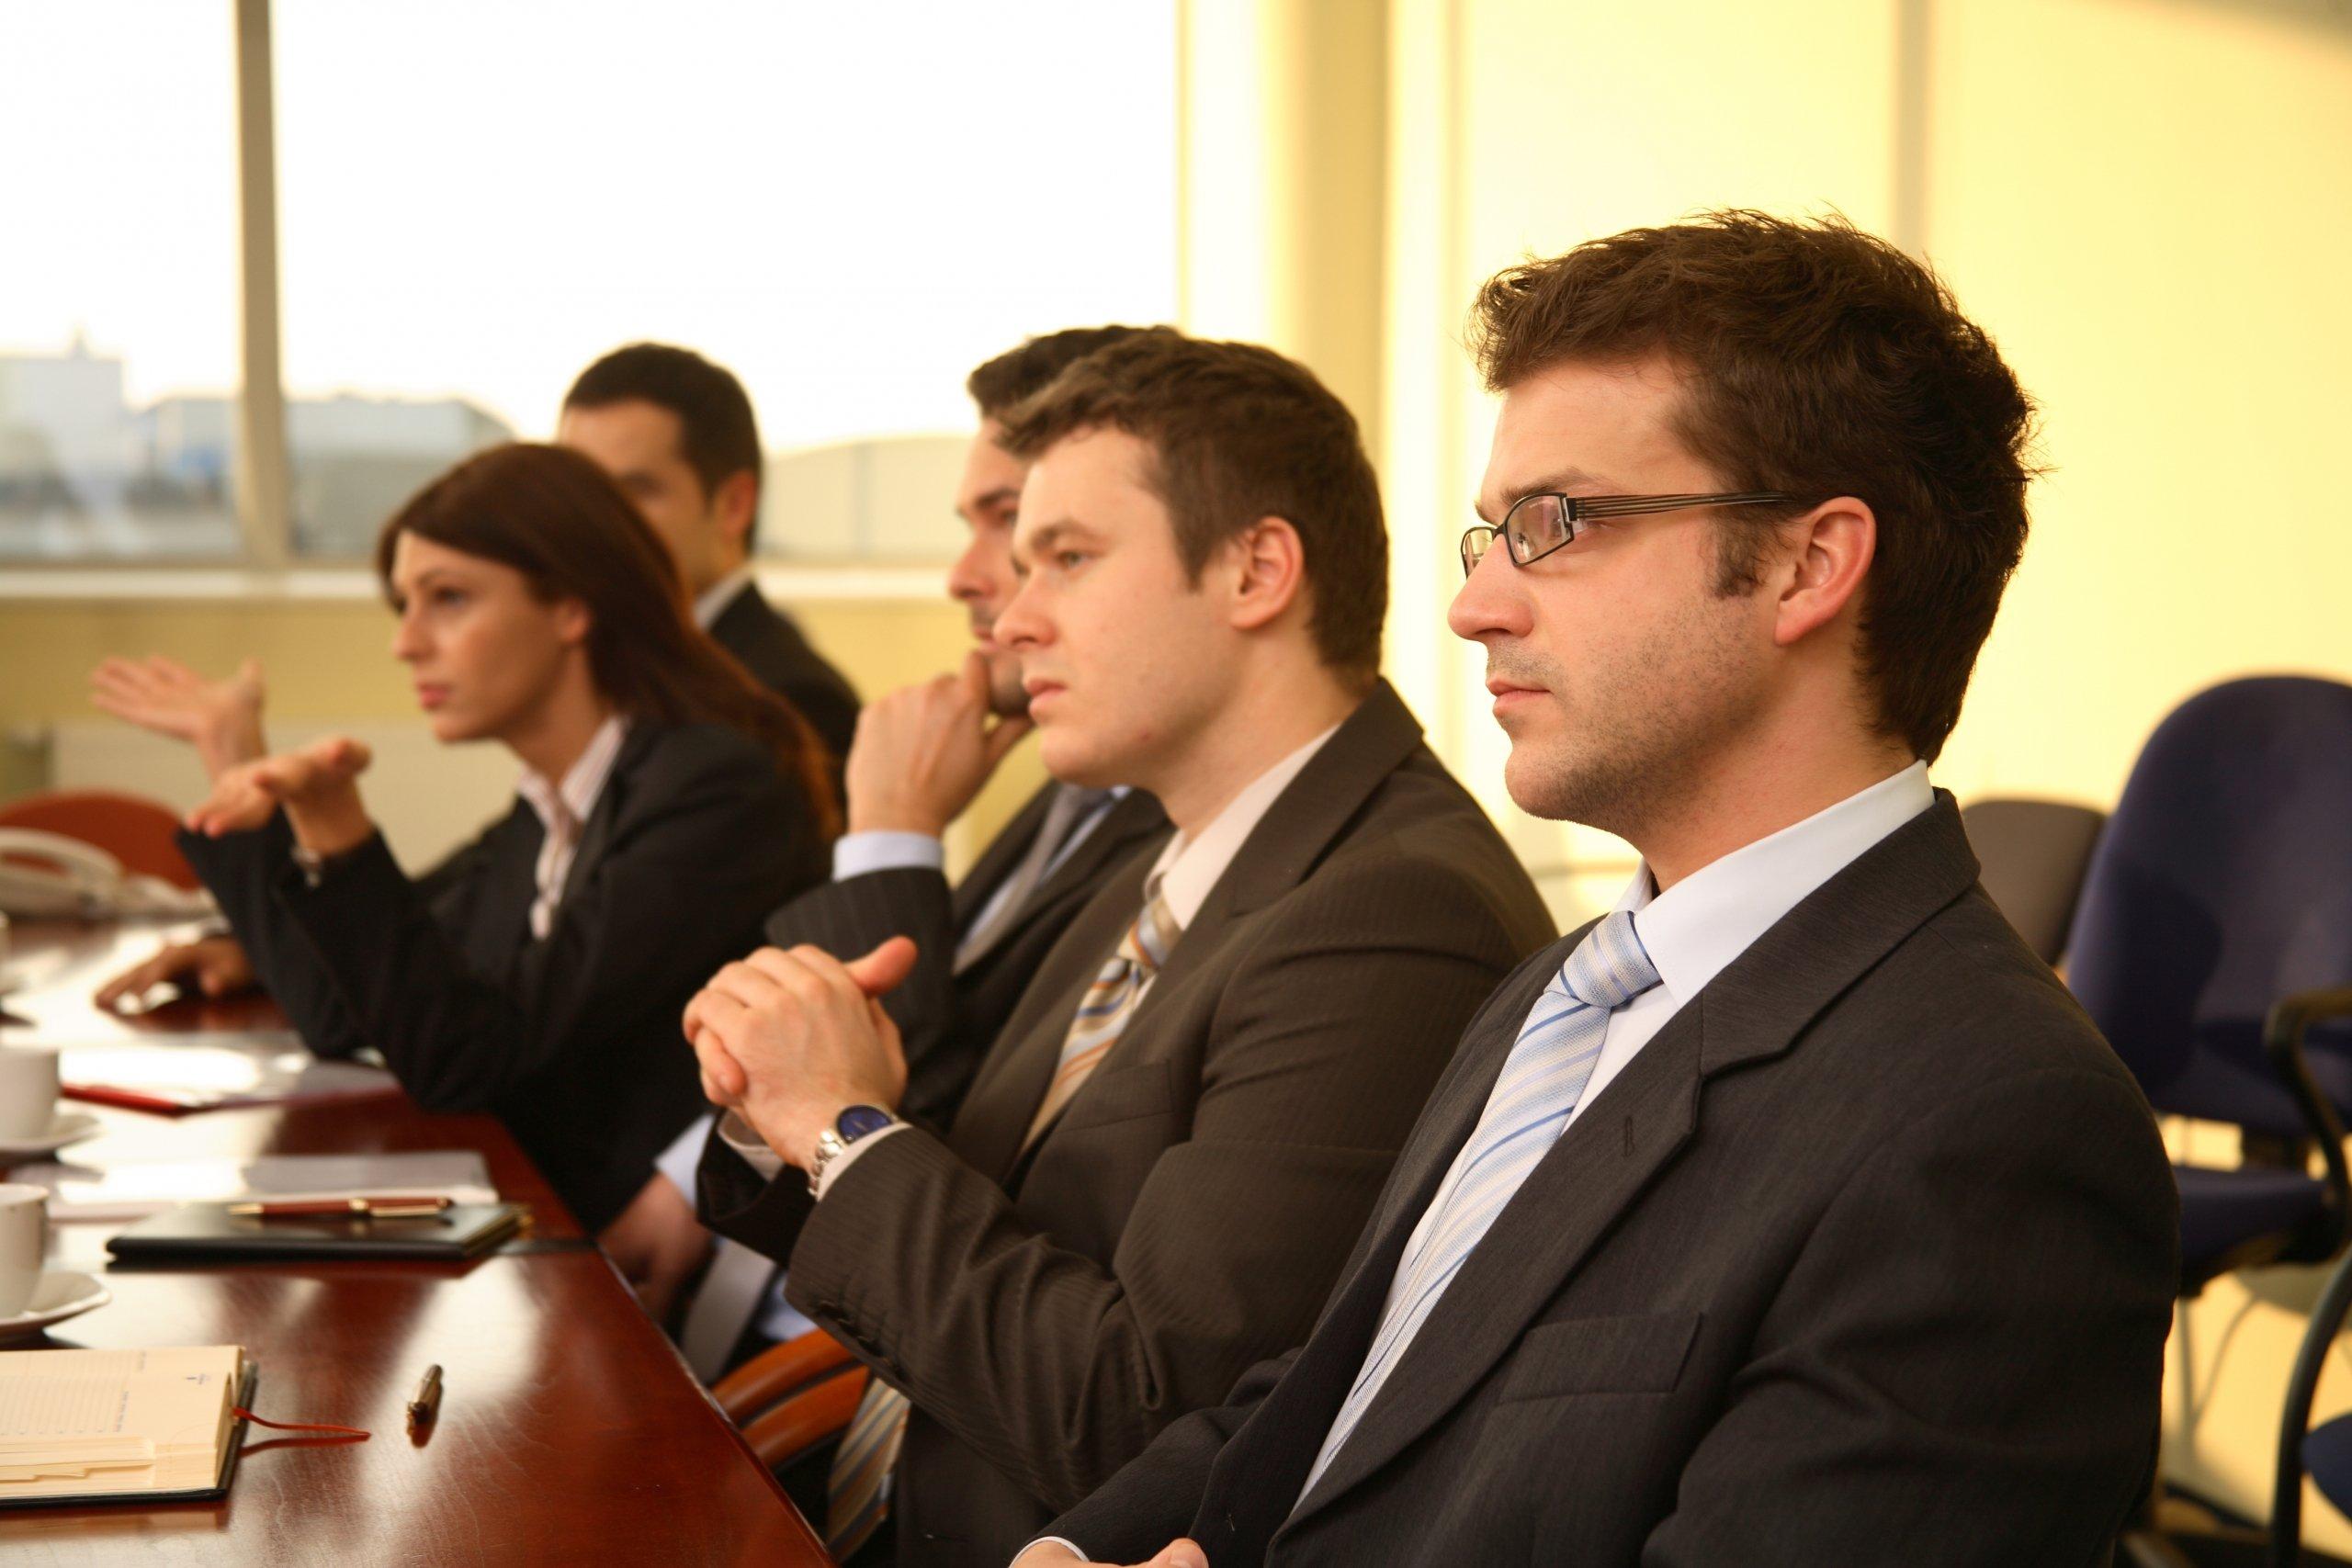 Business meeting in boardroom Panellists